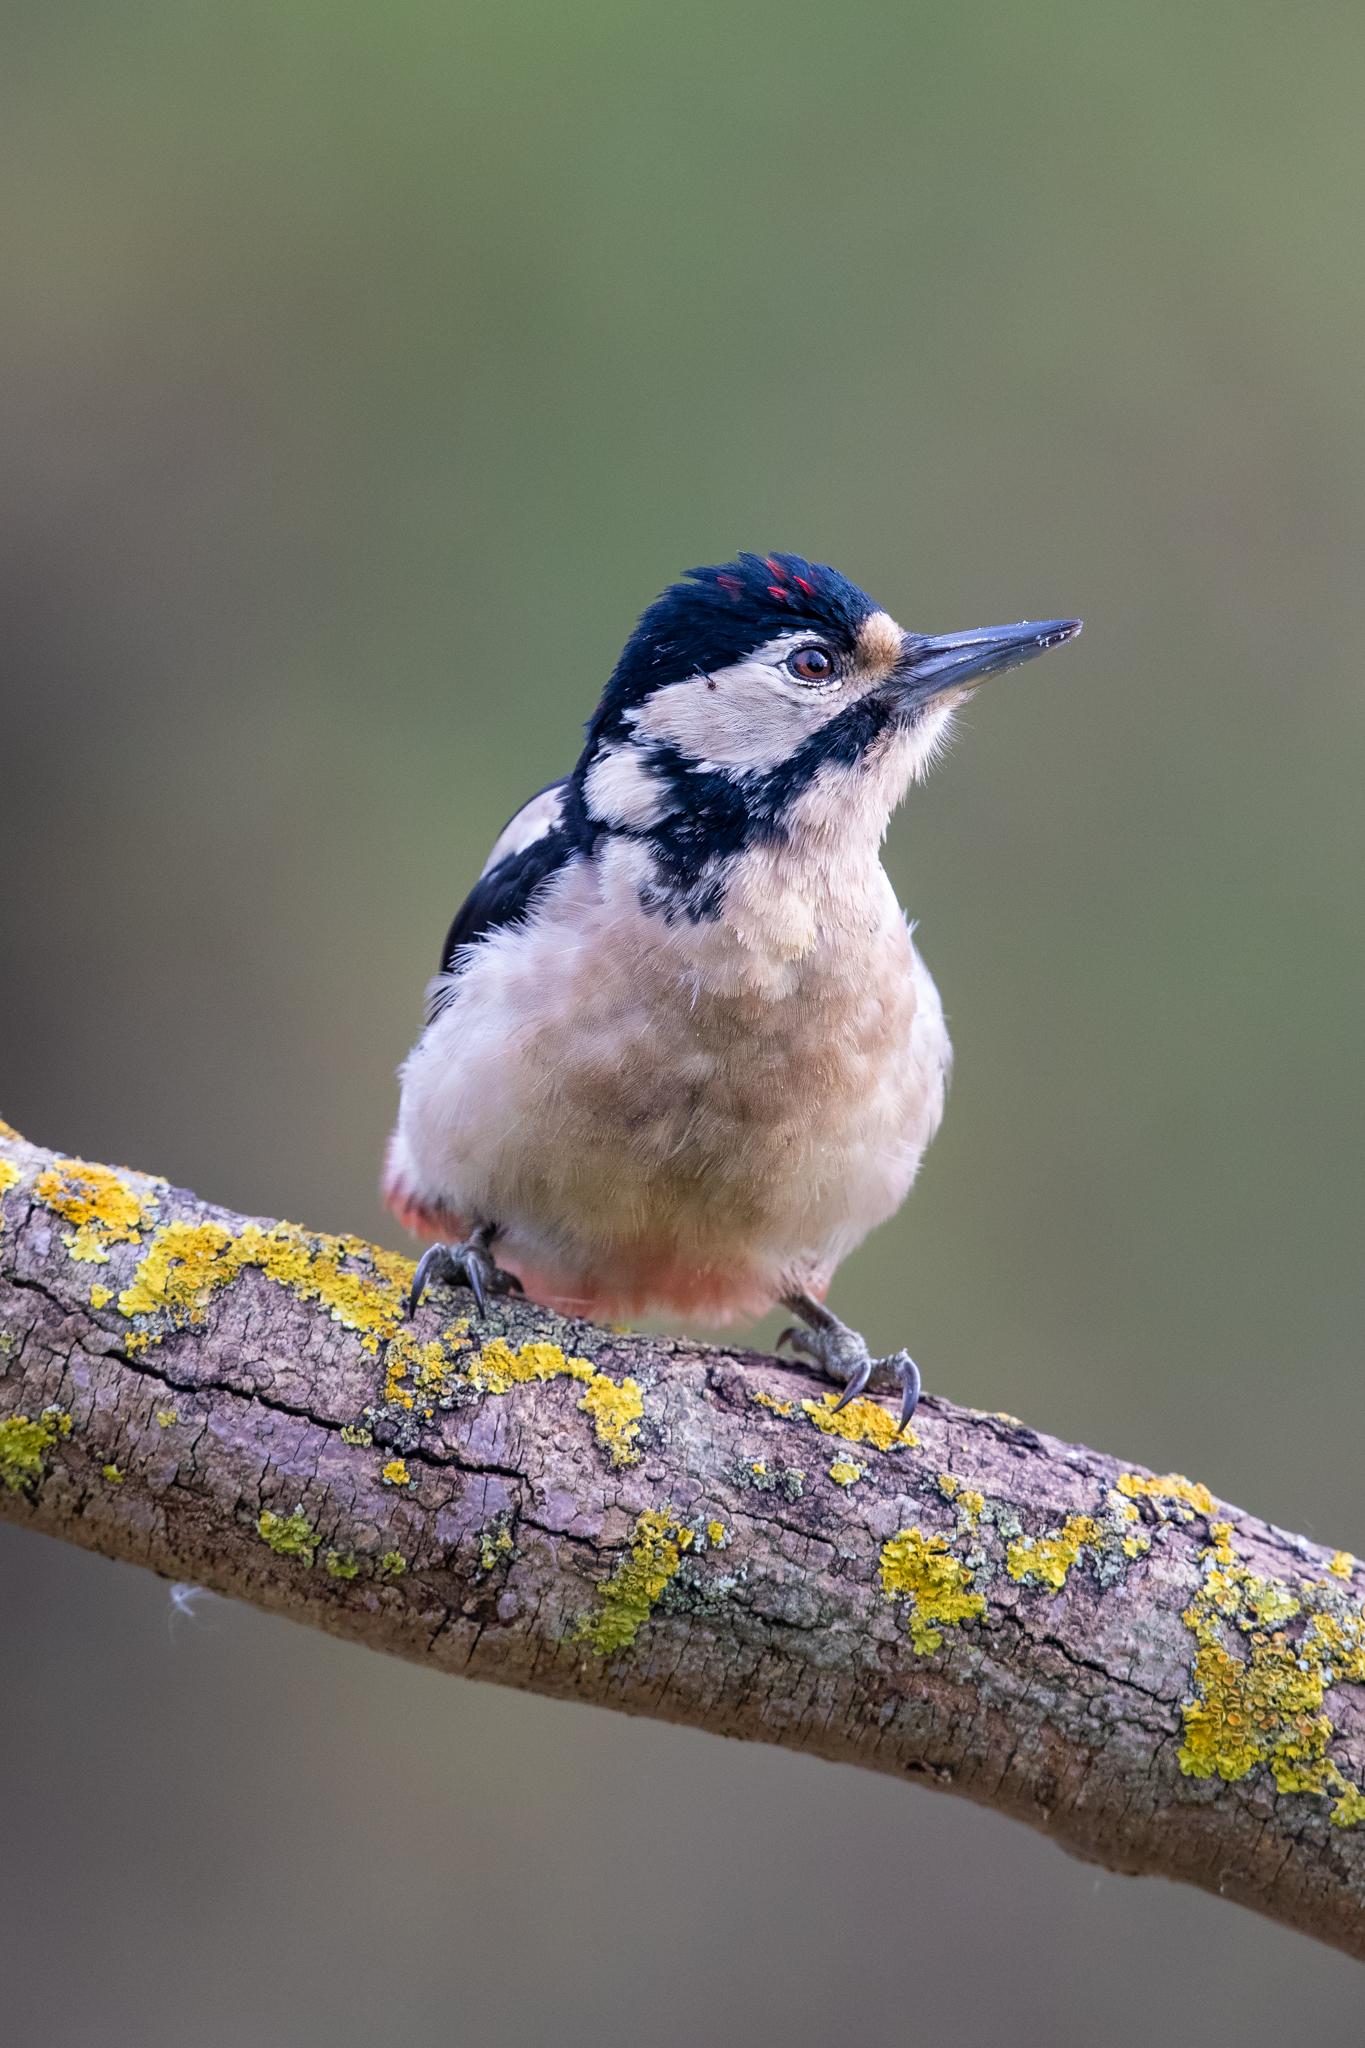 wodpecker noise reduction_A8I2619.jpg